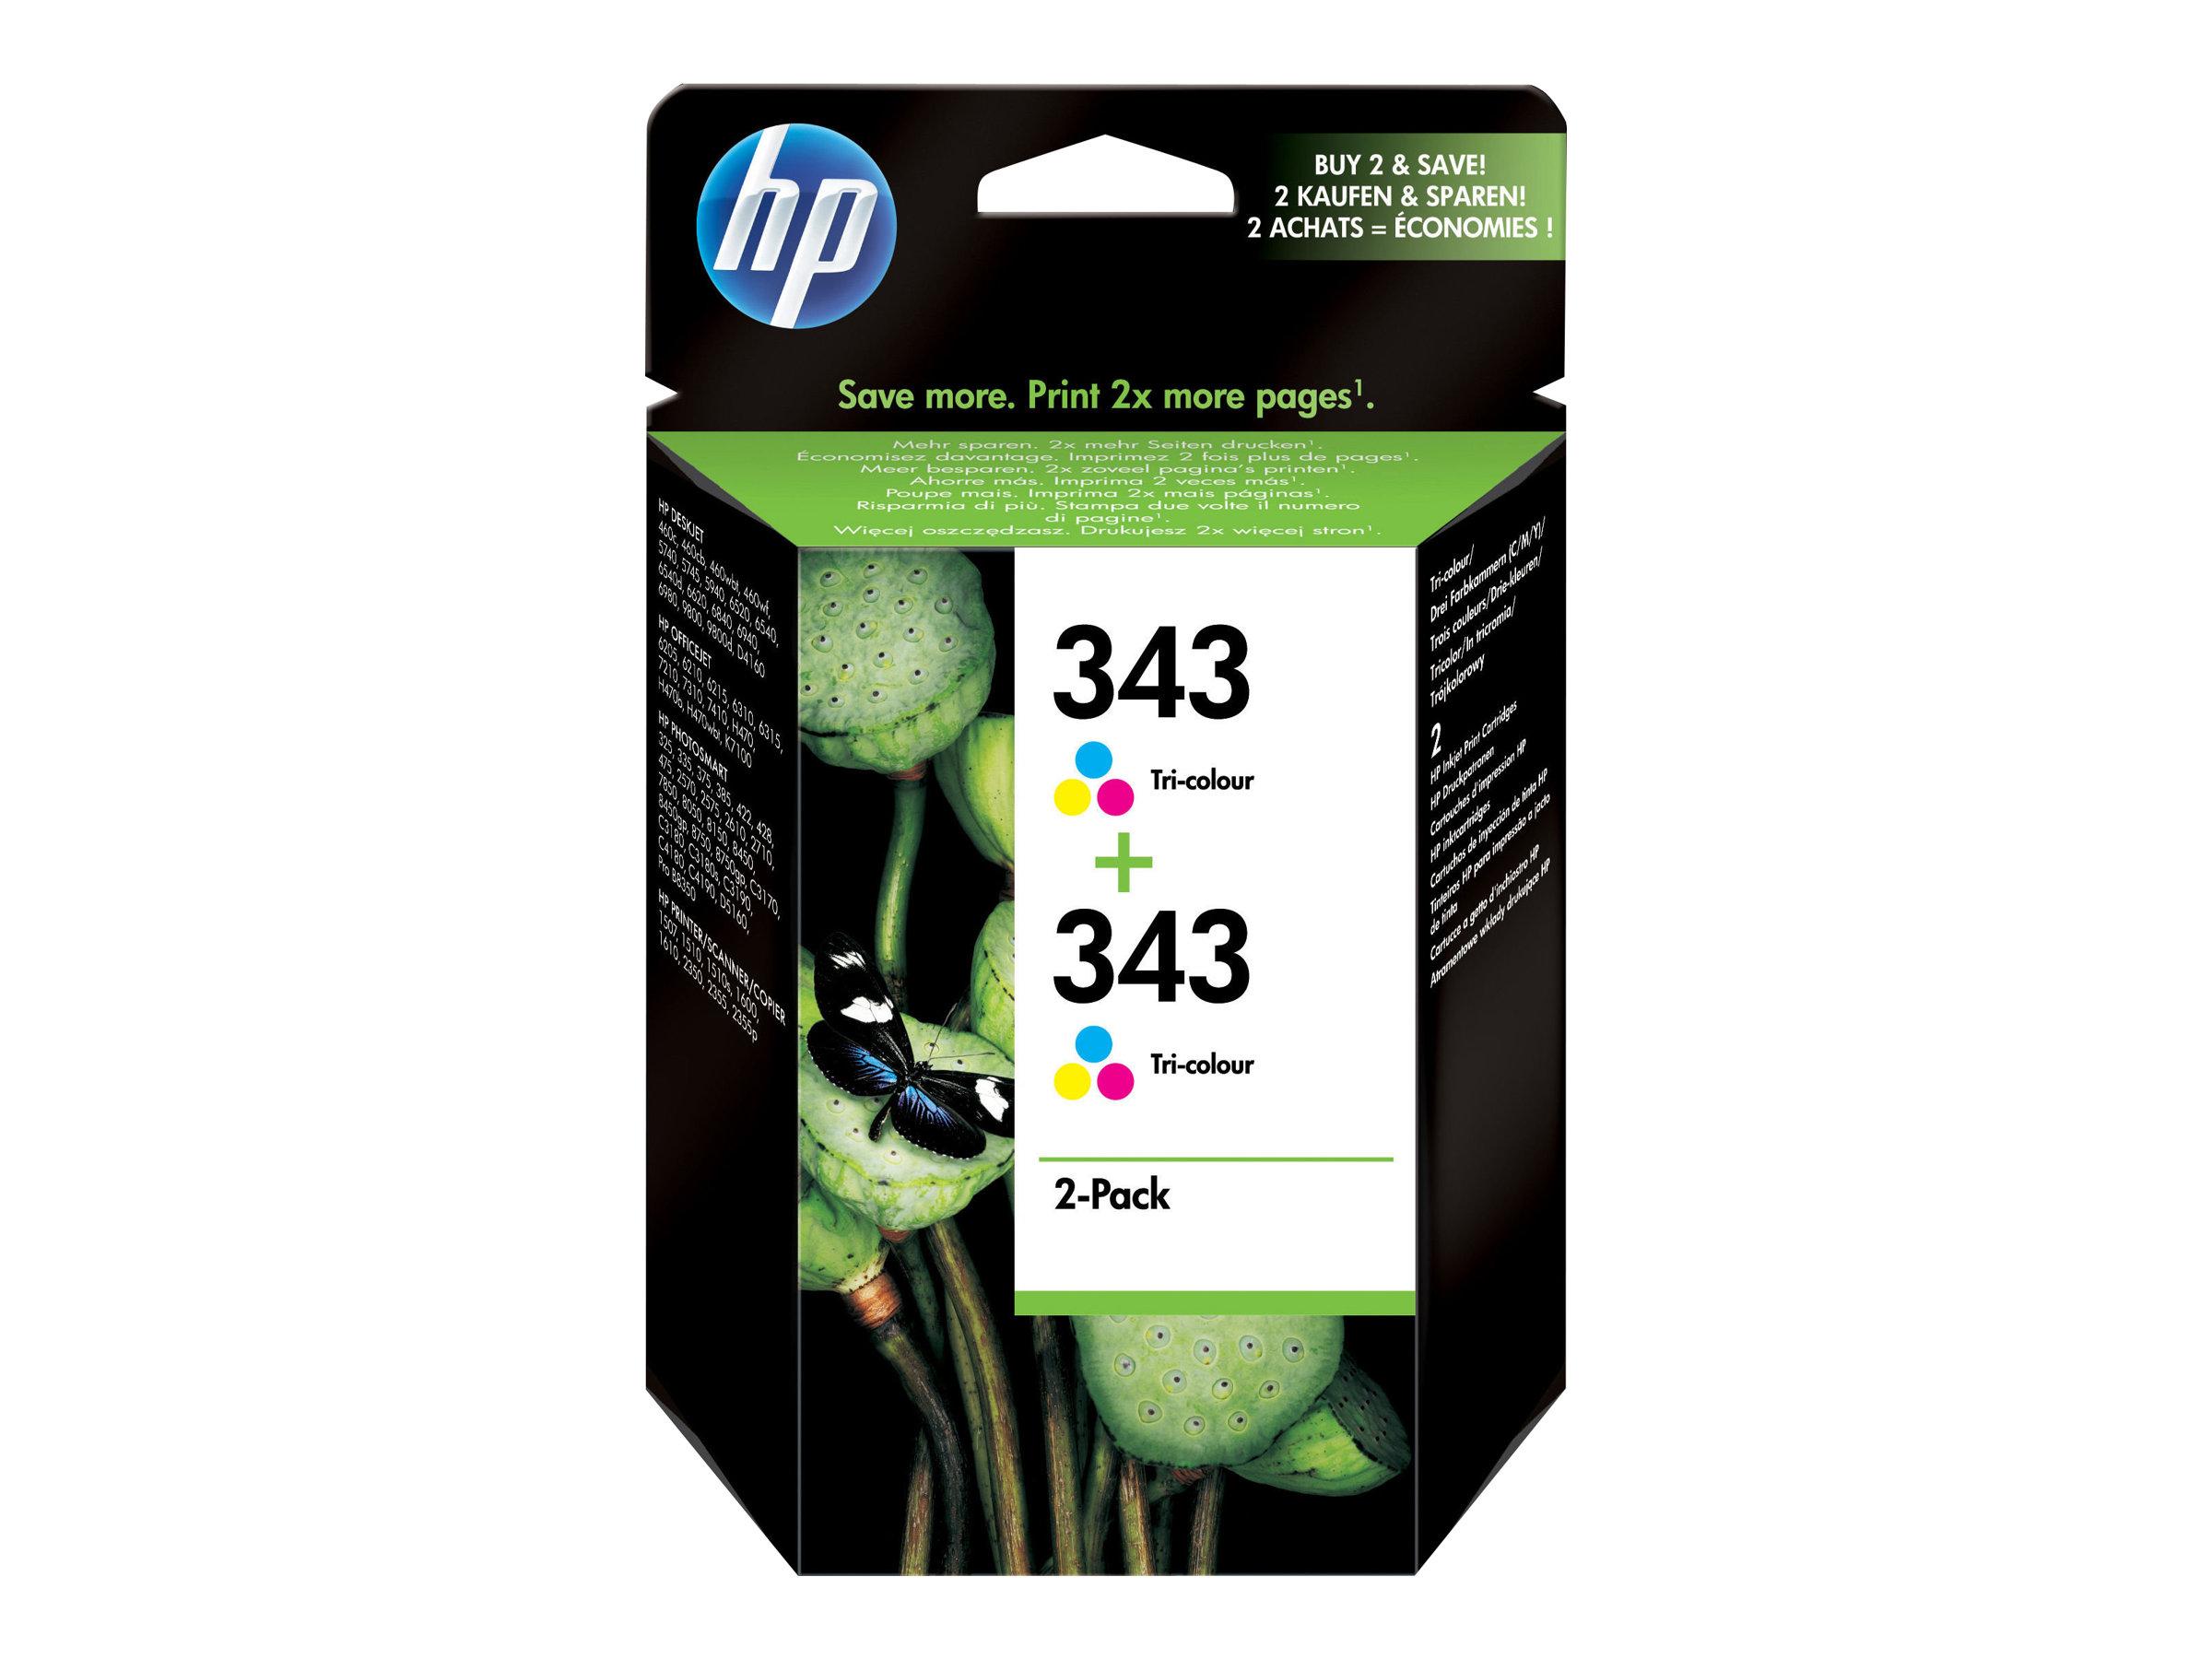 HP Tinte cyan/magenta/yellow Nr. 343 (CB332EE) ca. 330 Seiten, Doppelpack